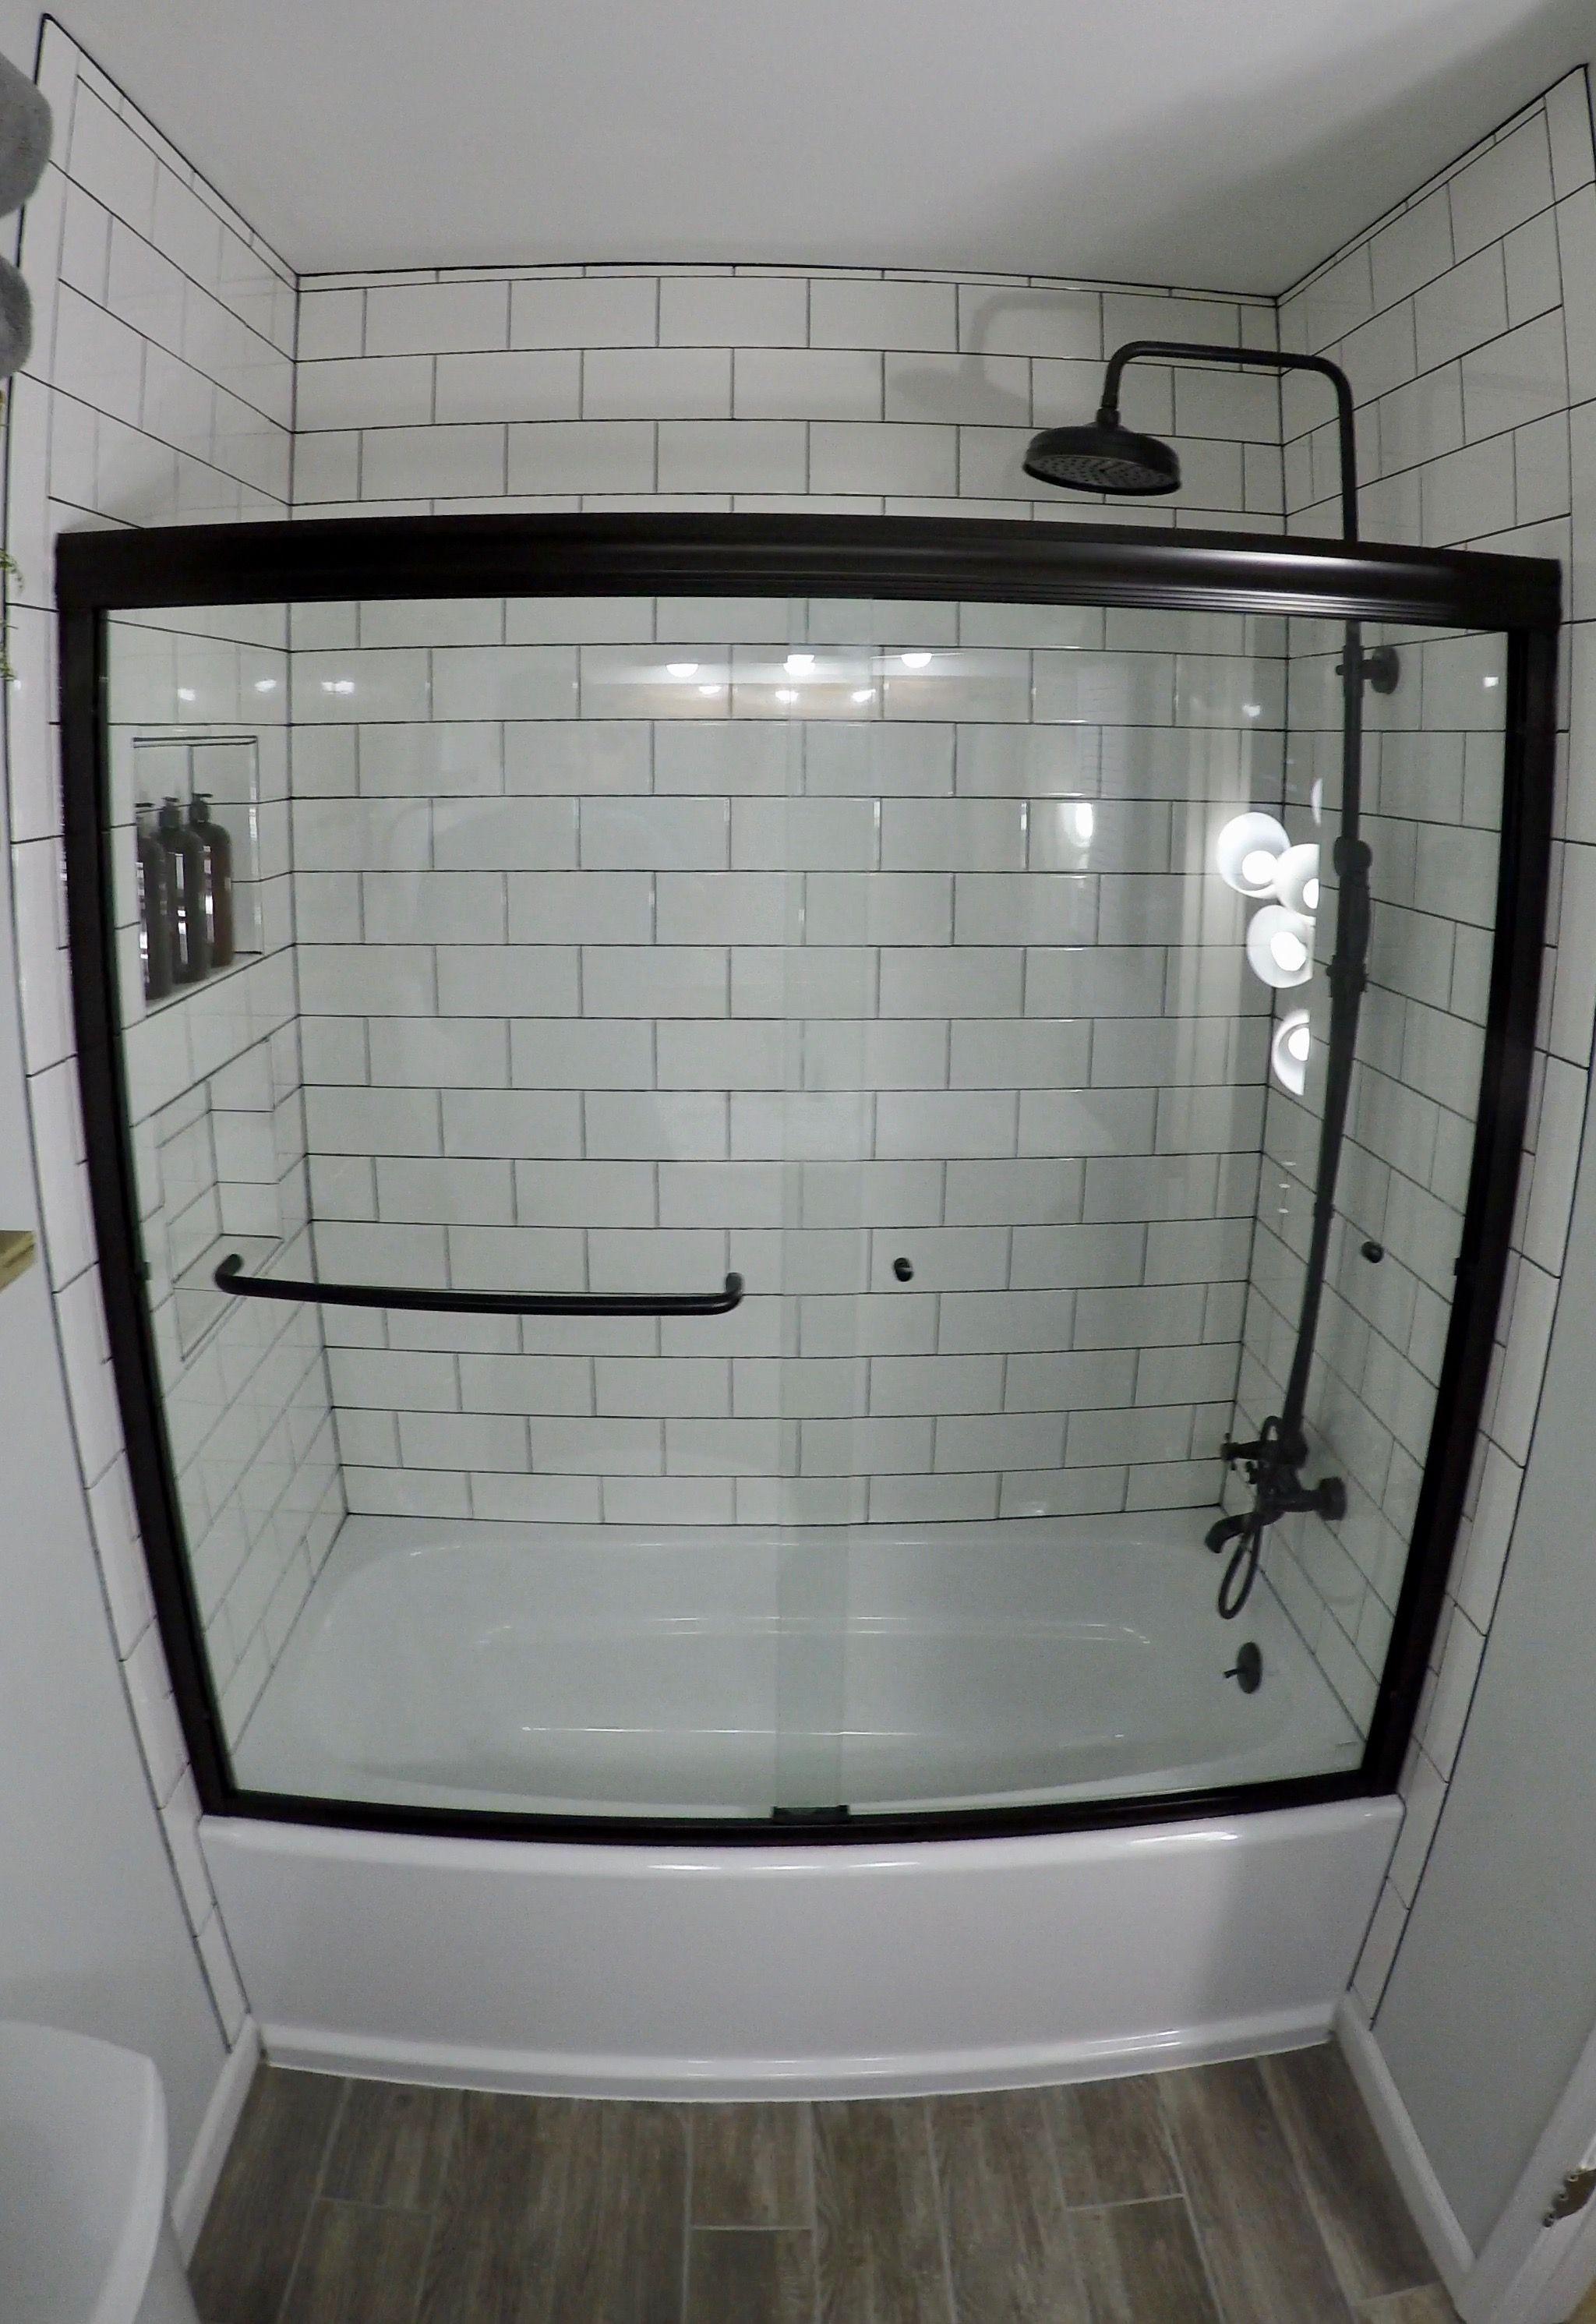 Remodel My House Remodelingideas Bathroom Tub Shower Bathroom